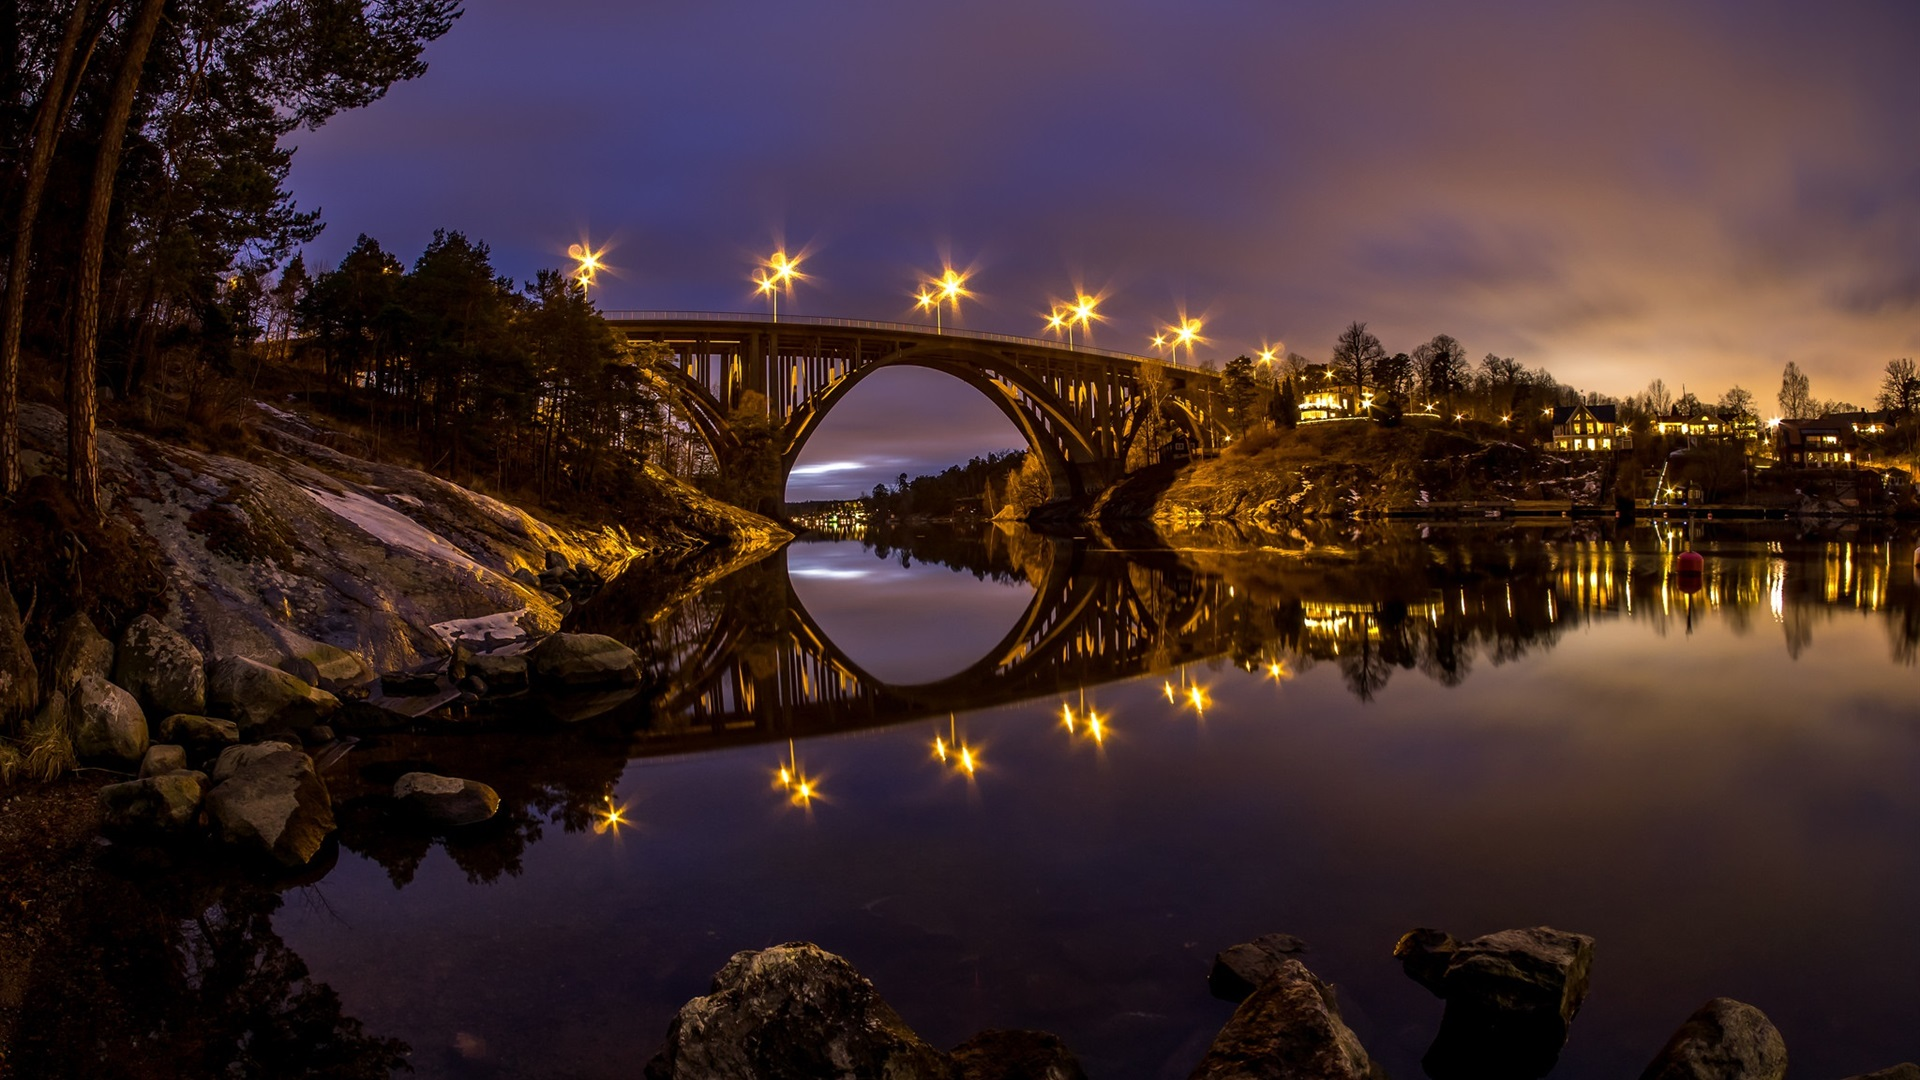 Download Wallpaper 1920x1080 River Sunset Bridge: Download Wallpaper 1920x1080 Sweden, River, Bridge, Water